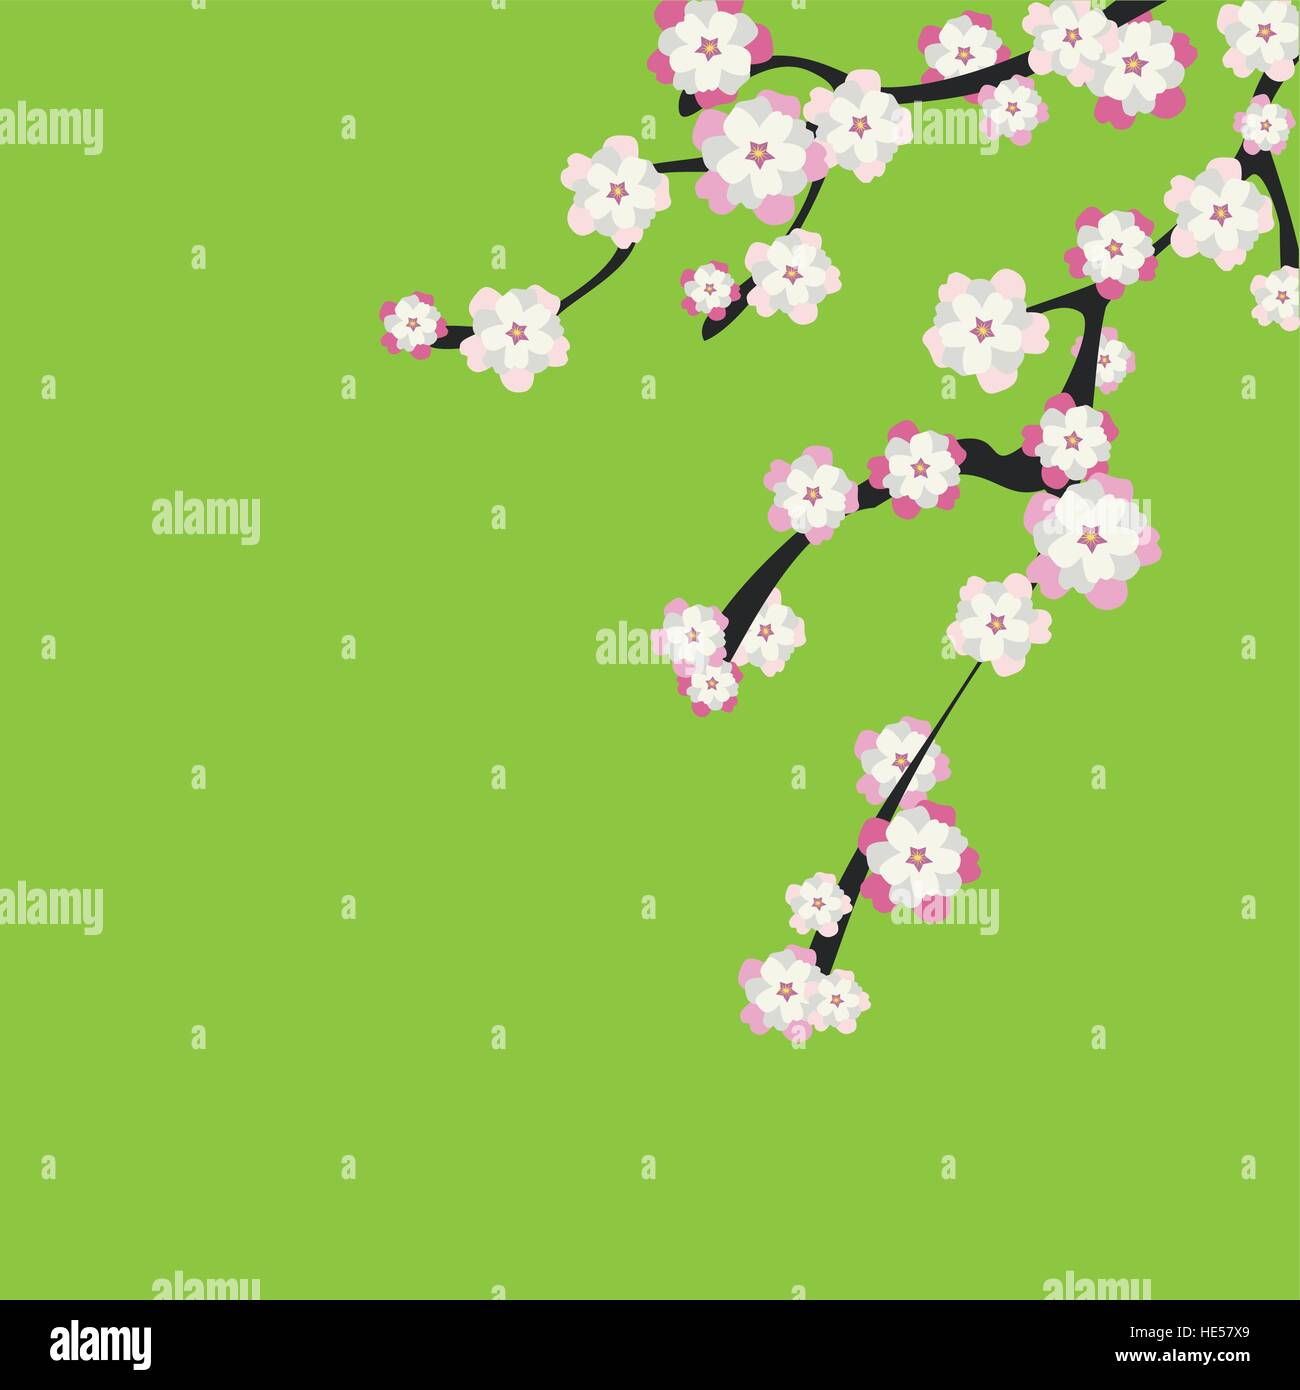 Japanese Garden Stock Vector Images - Alamy